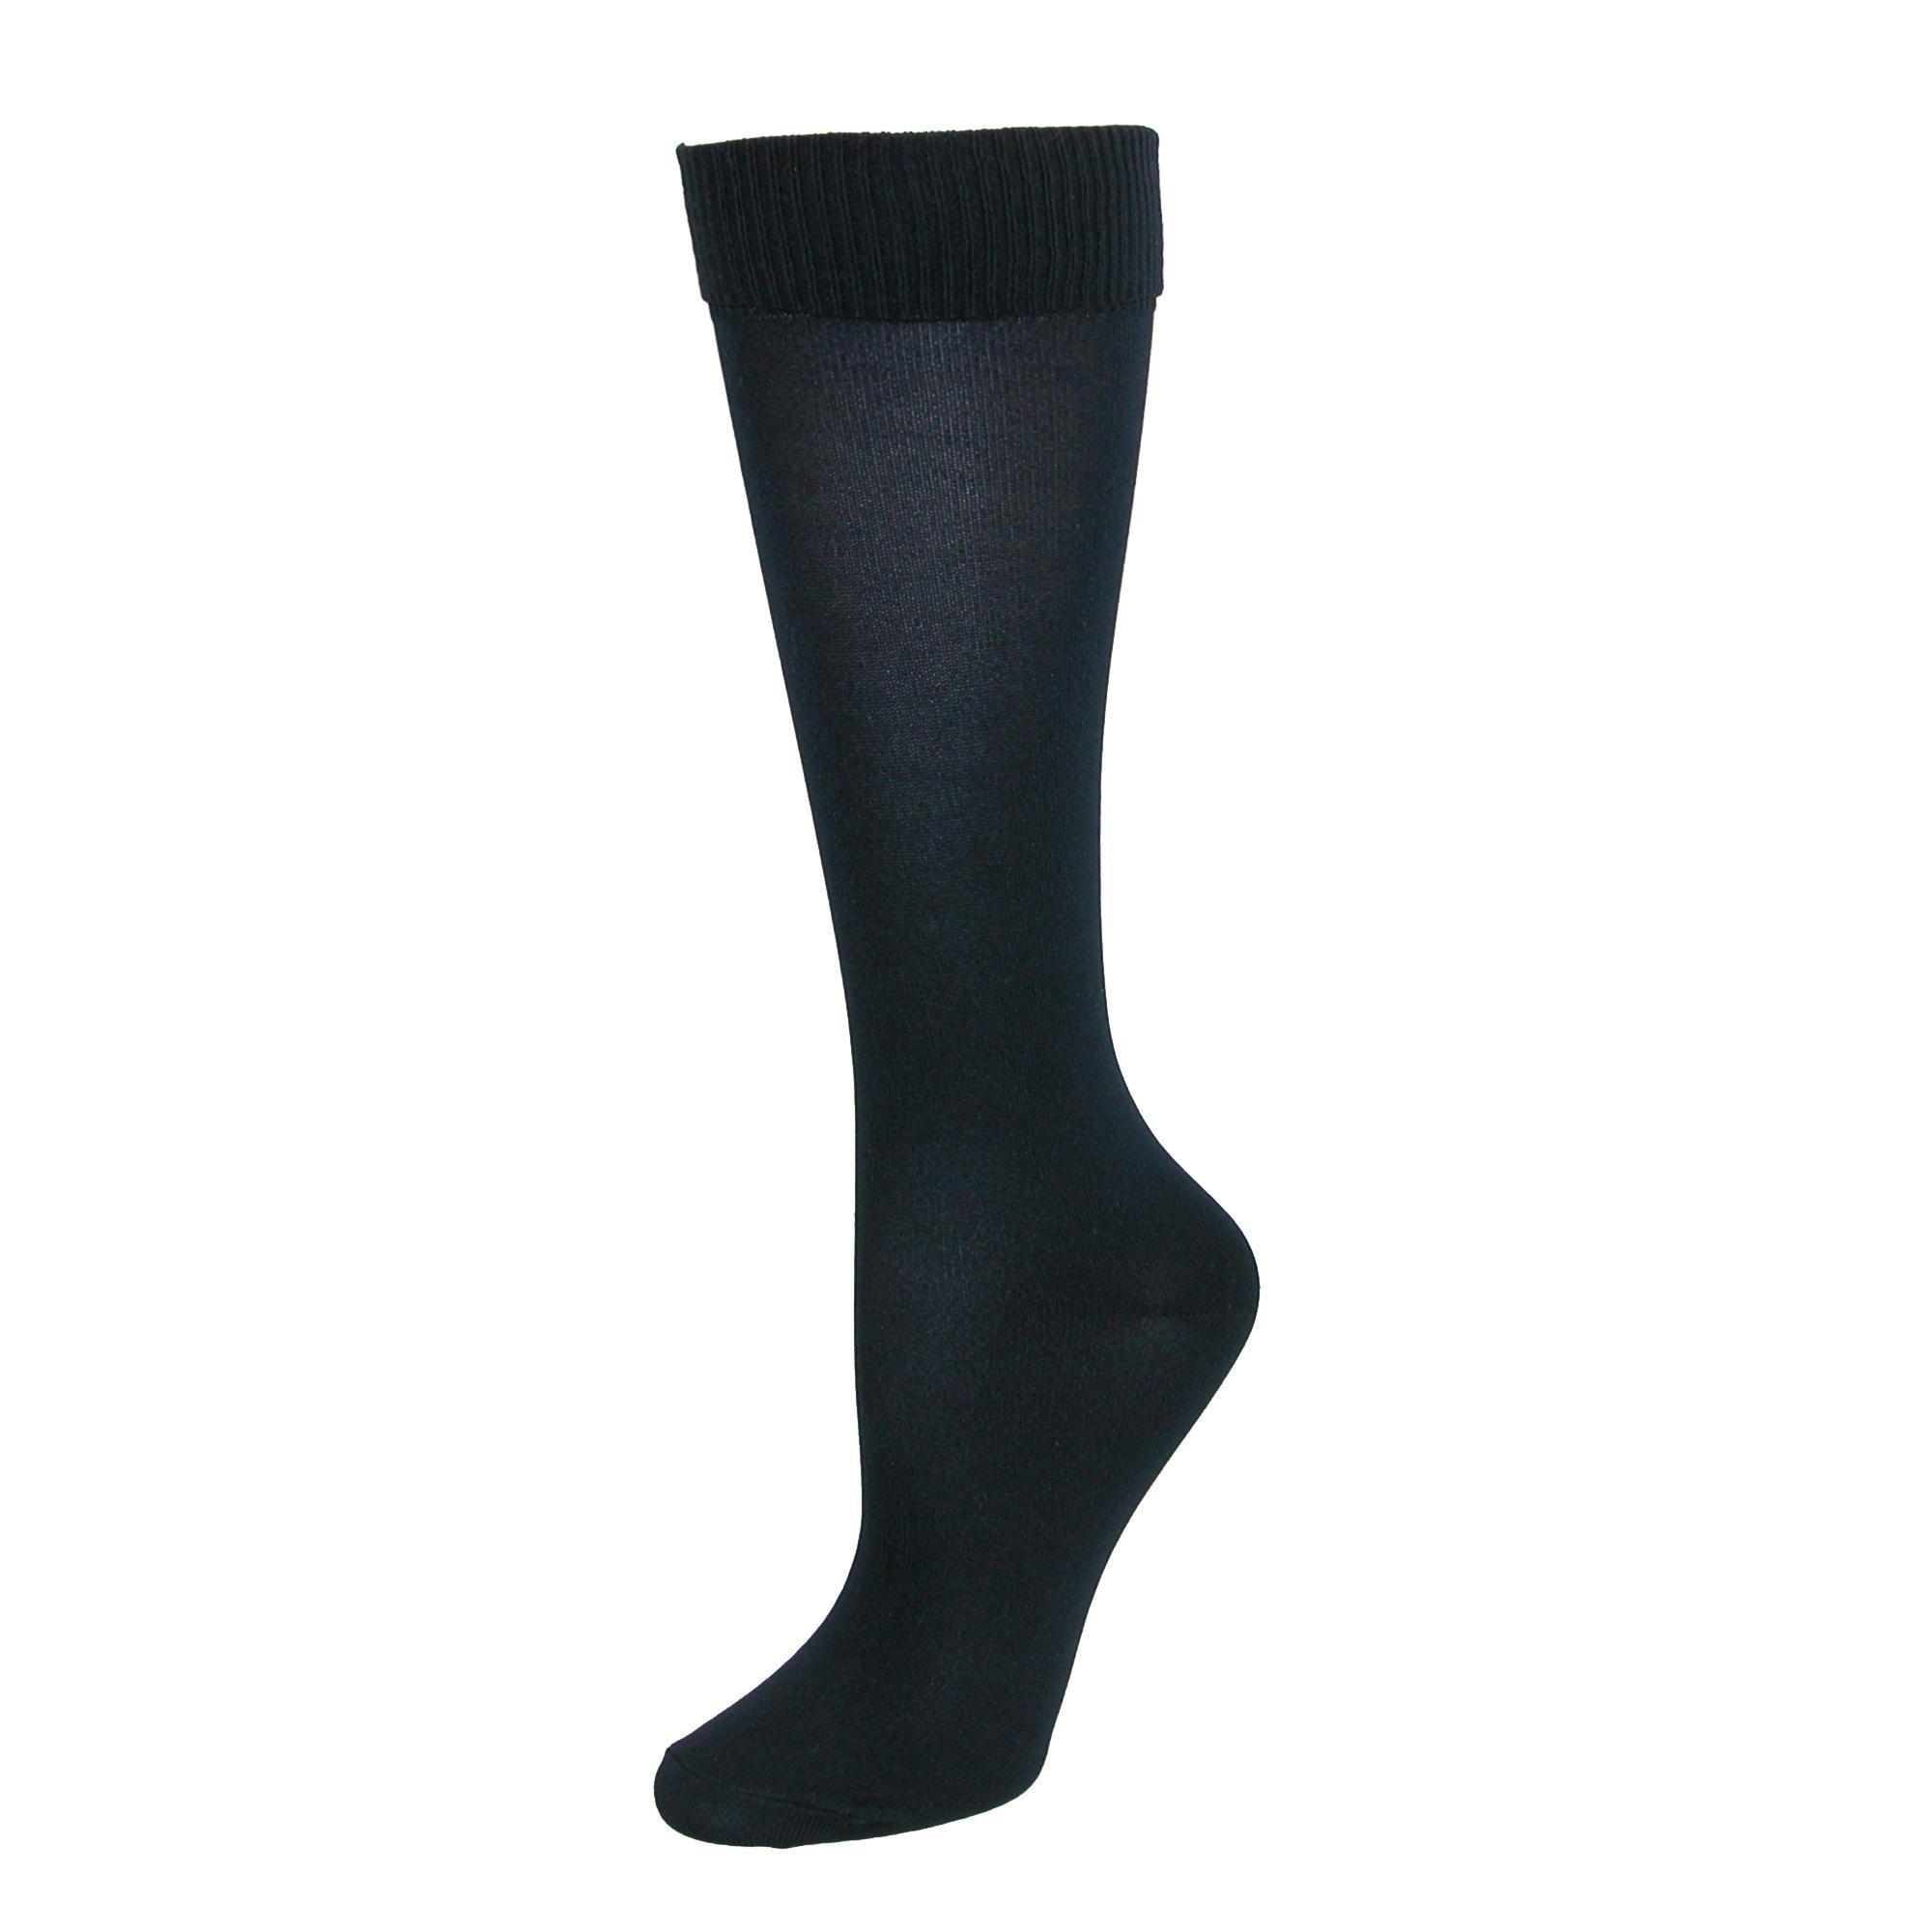 a057a0380 Shop Jefferies Socks Girl s School Uniform Knee High Socks (3 Pair ...